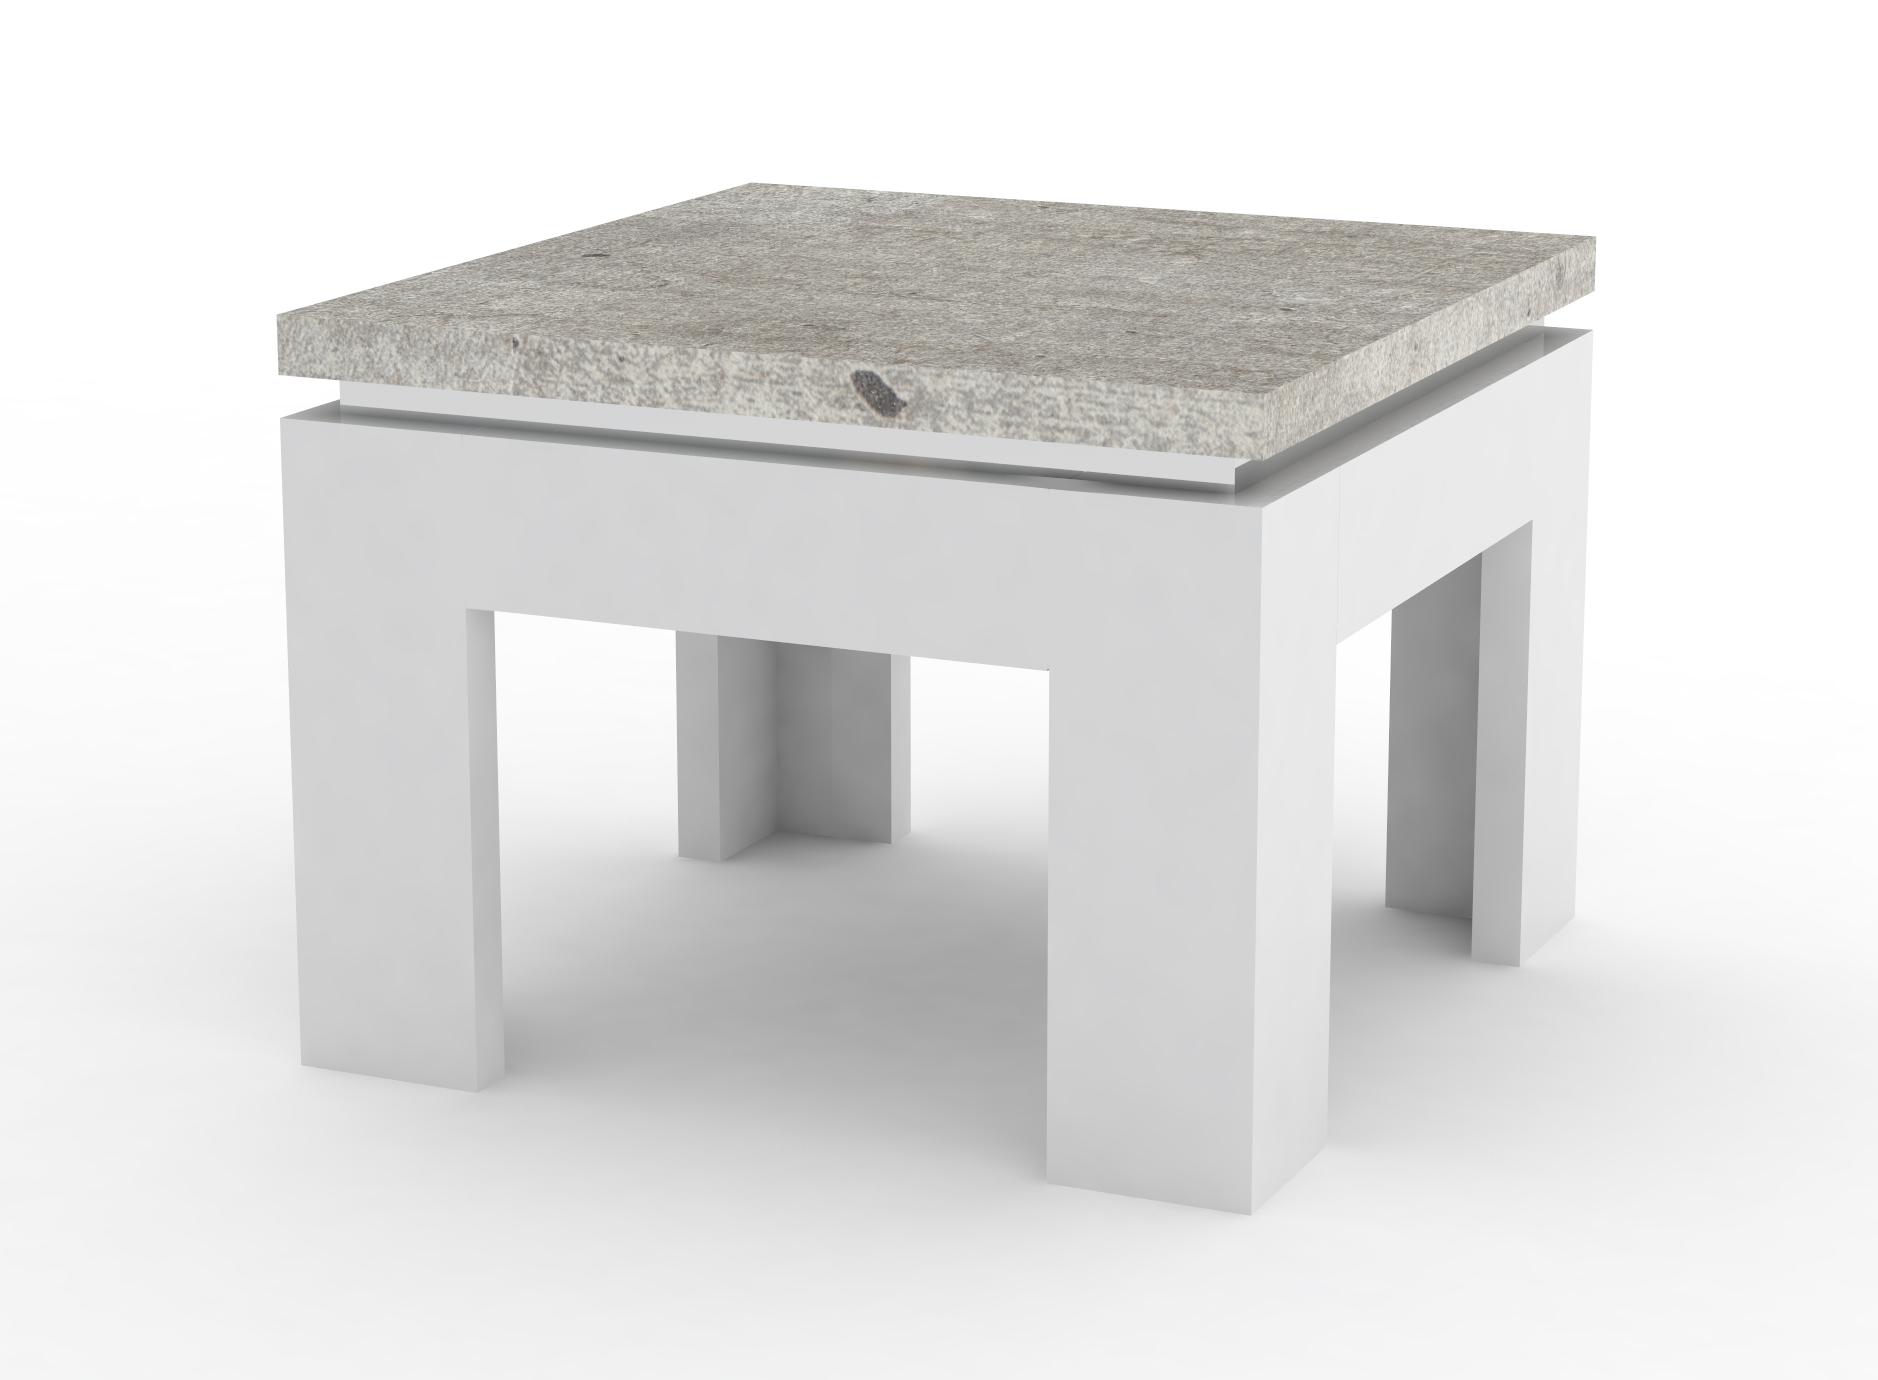 Table Basse Design Carree Blanc Laque Decor Ciment Ginko